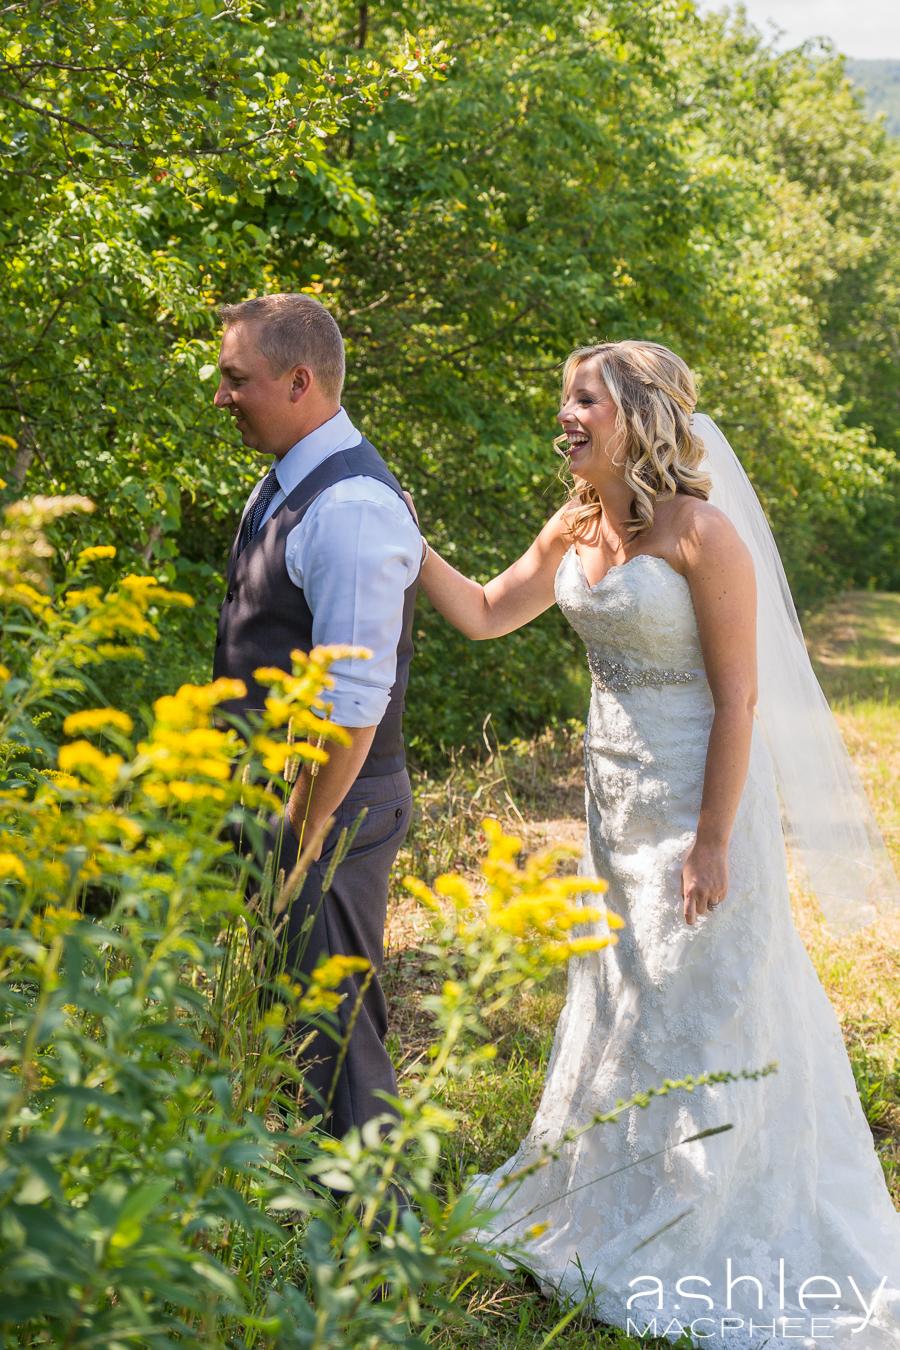 Ashley MacPhee Photography New Brunswick Wedding Photographer (23 of 65).jpg